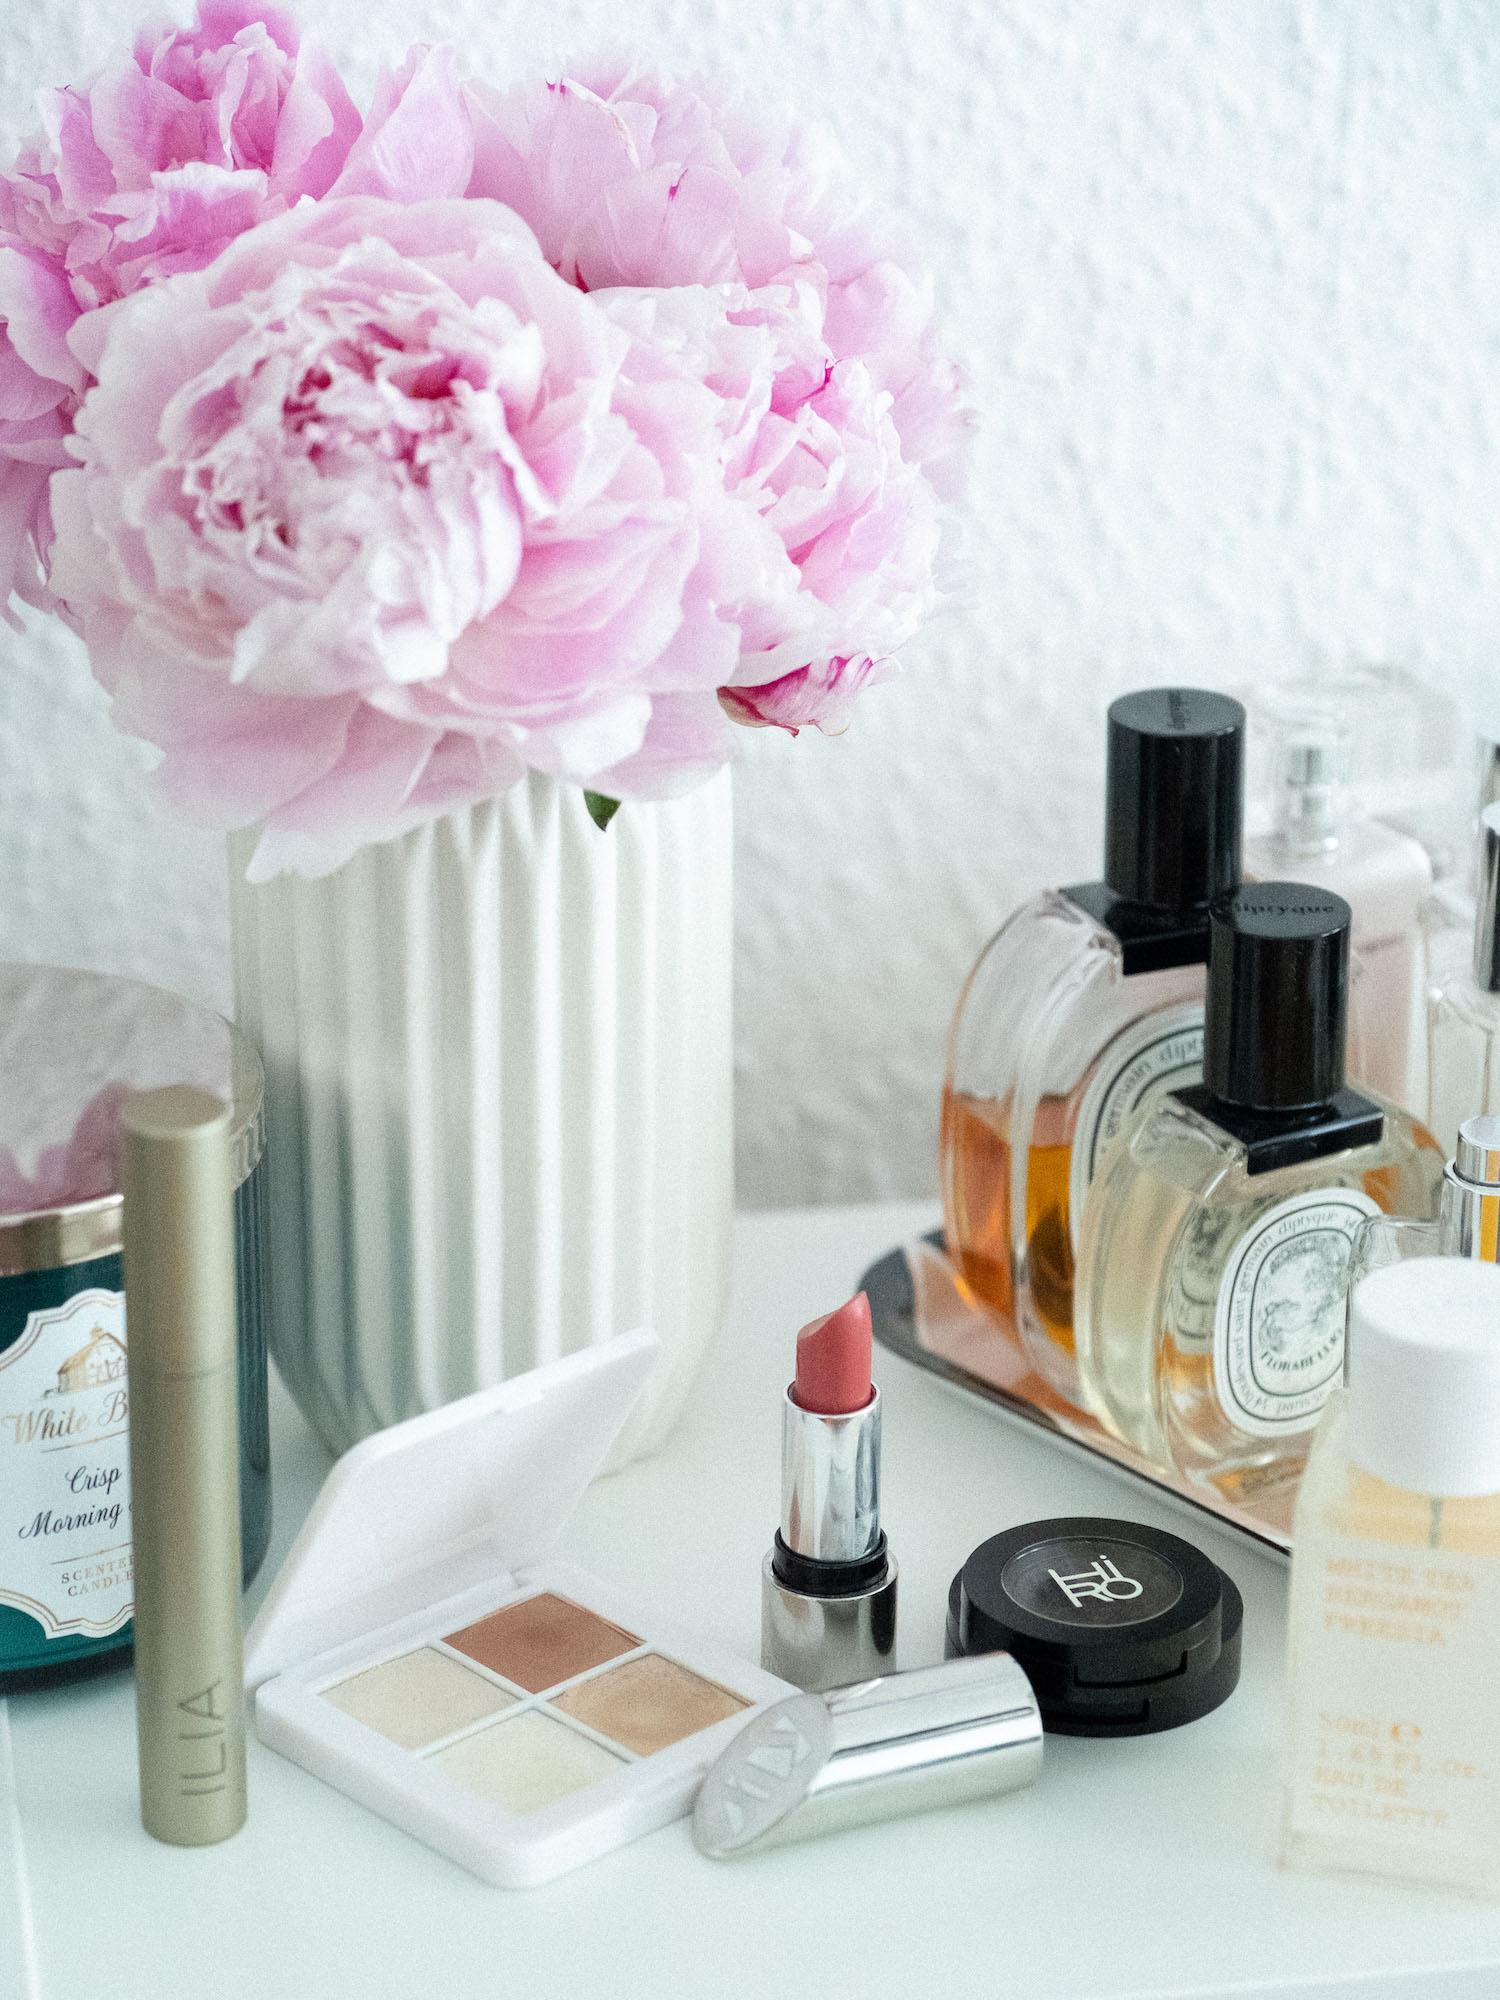 Beautyblog Sarah Khurshid Amazingy rms beauty Palette